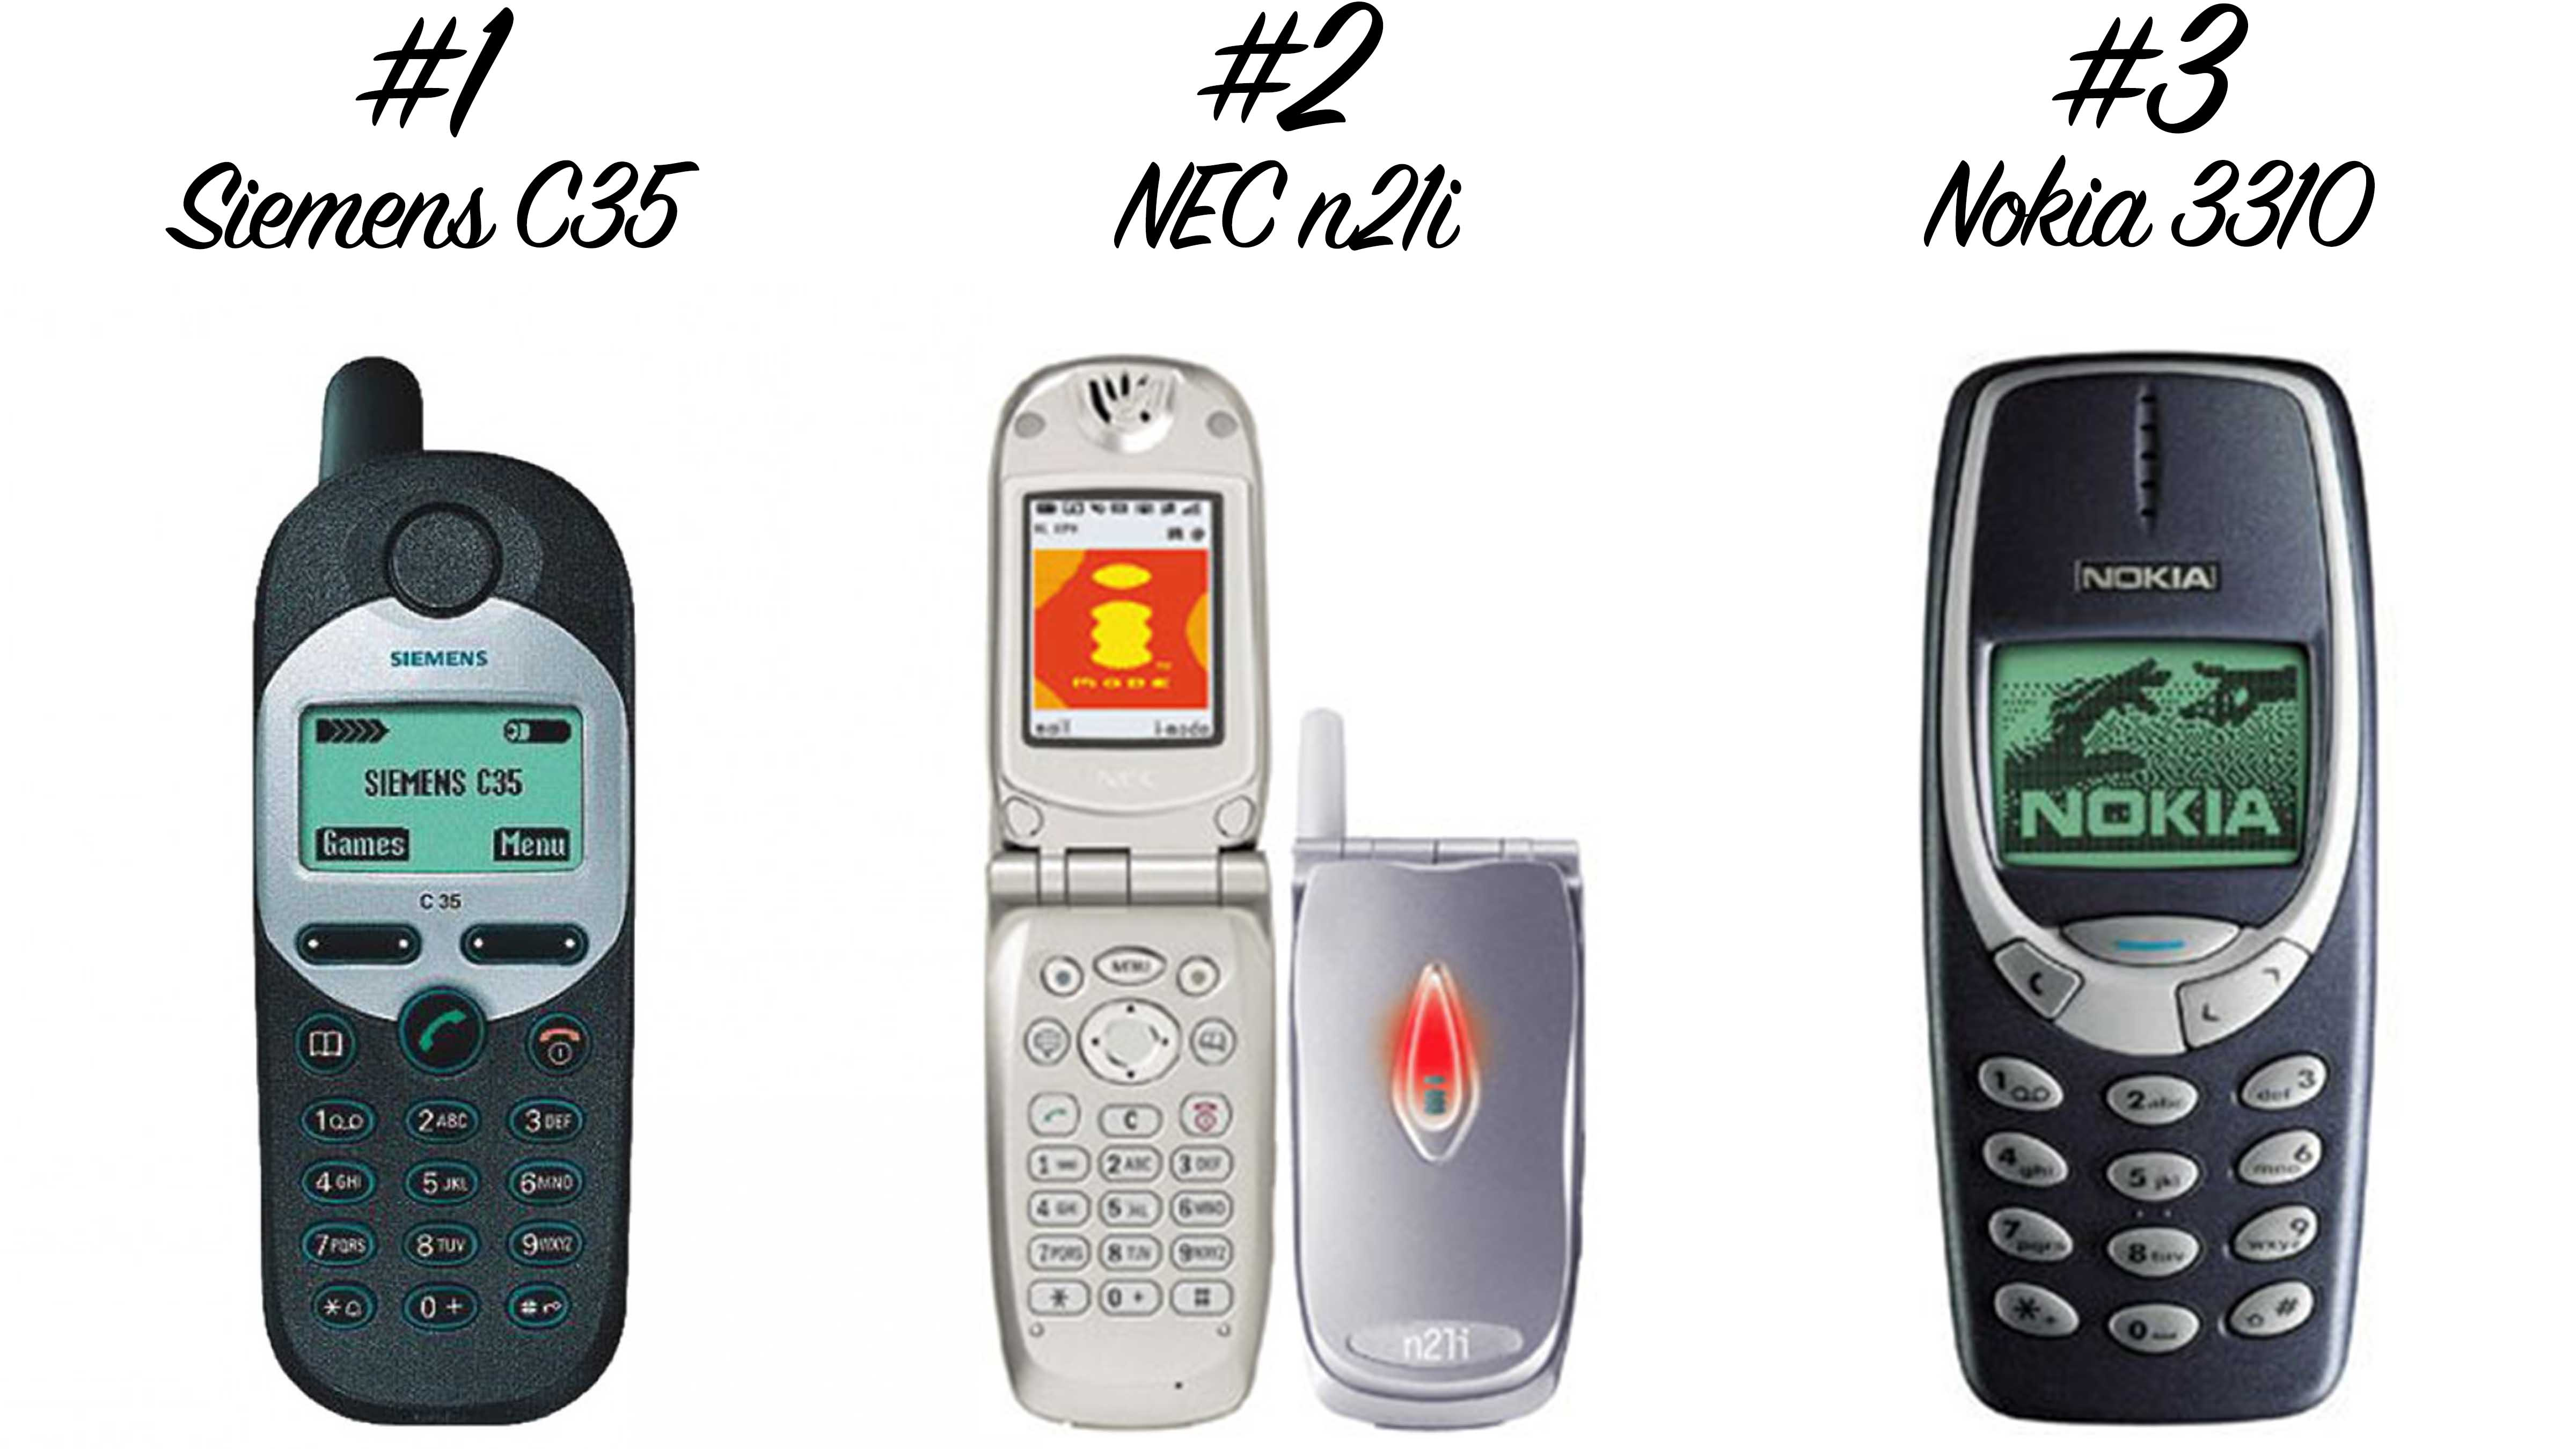 Retro Handys: Siemens C35, NEC n21i, Nokia 3310